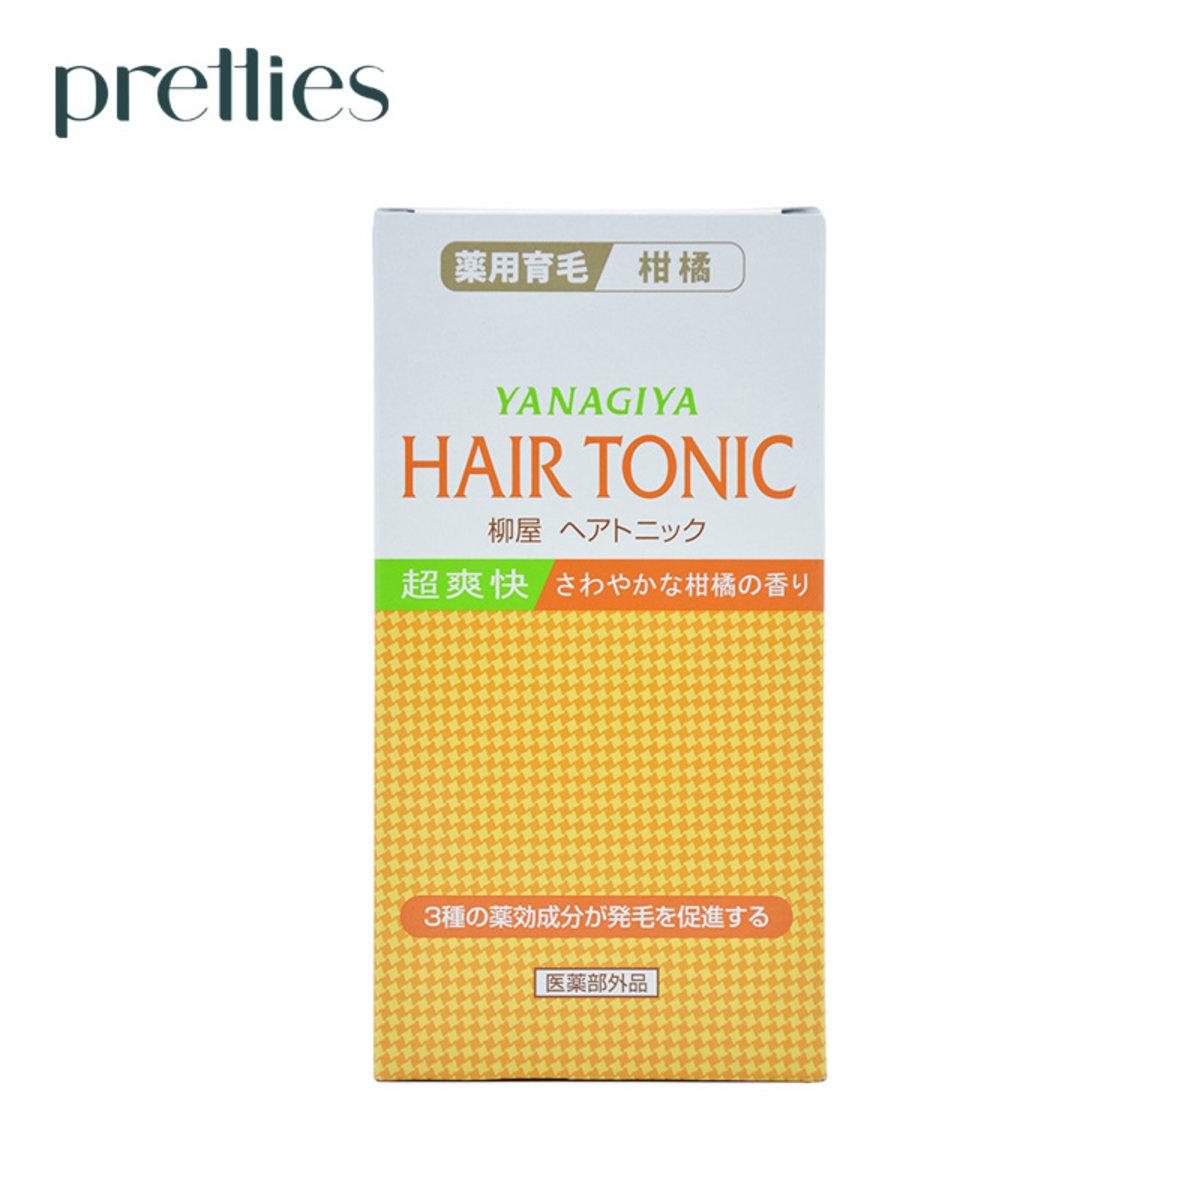 Hair Tonic (Citrus) 240ml (4903018113518)